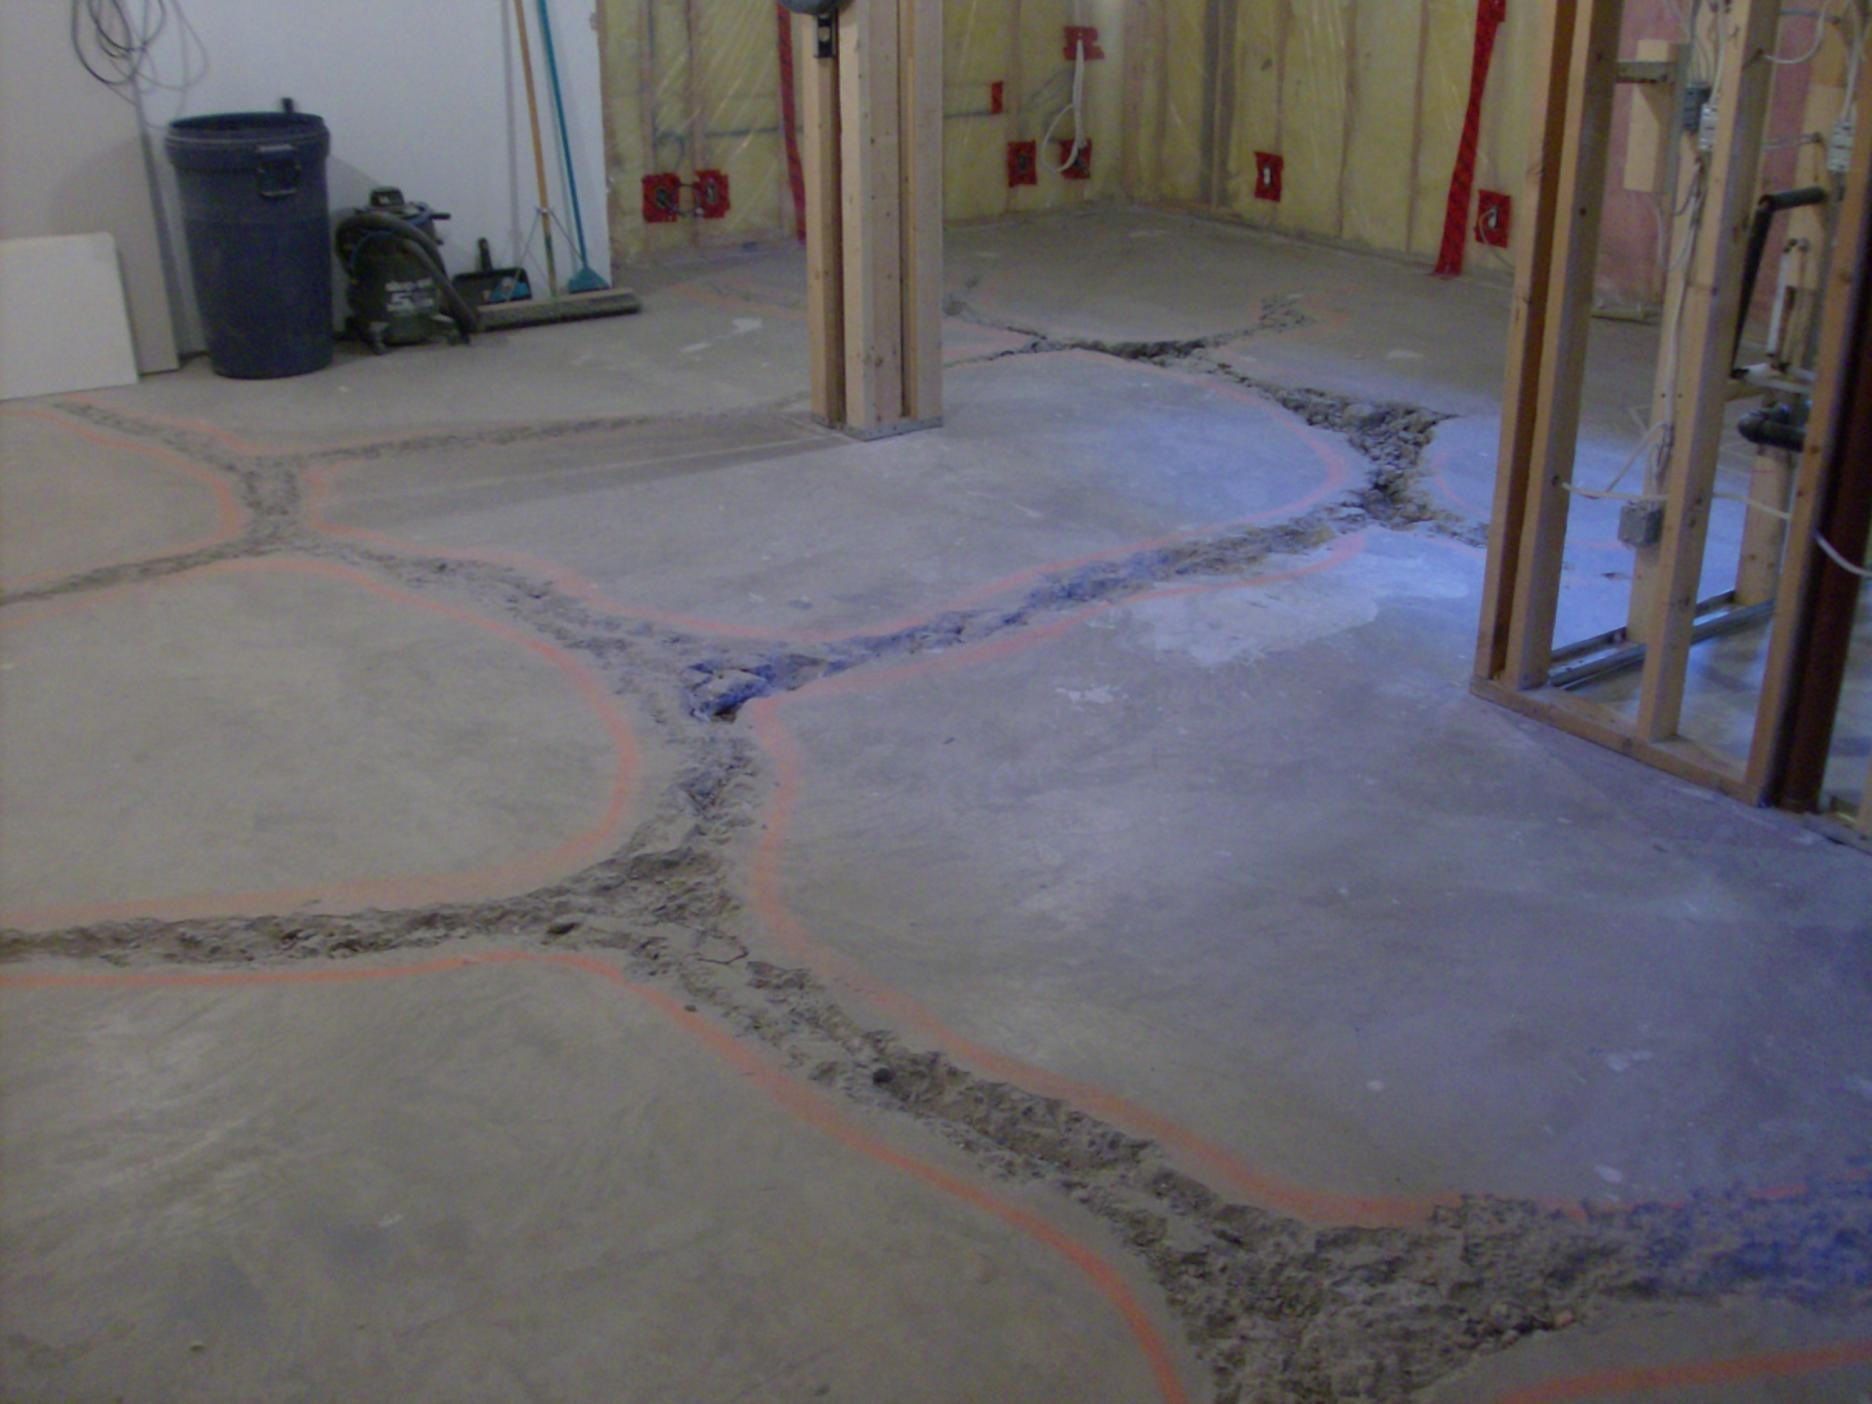 Method For Leveling Concrete Basement Floor Method For Leveling Concrete Basement Floor leveling a concrete basement floor akioz 1872 X 1404